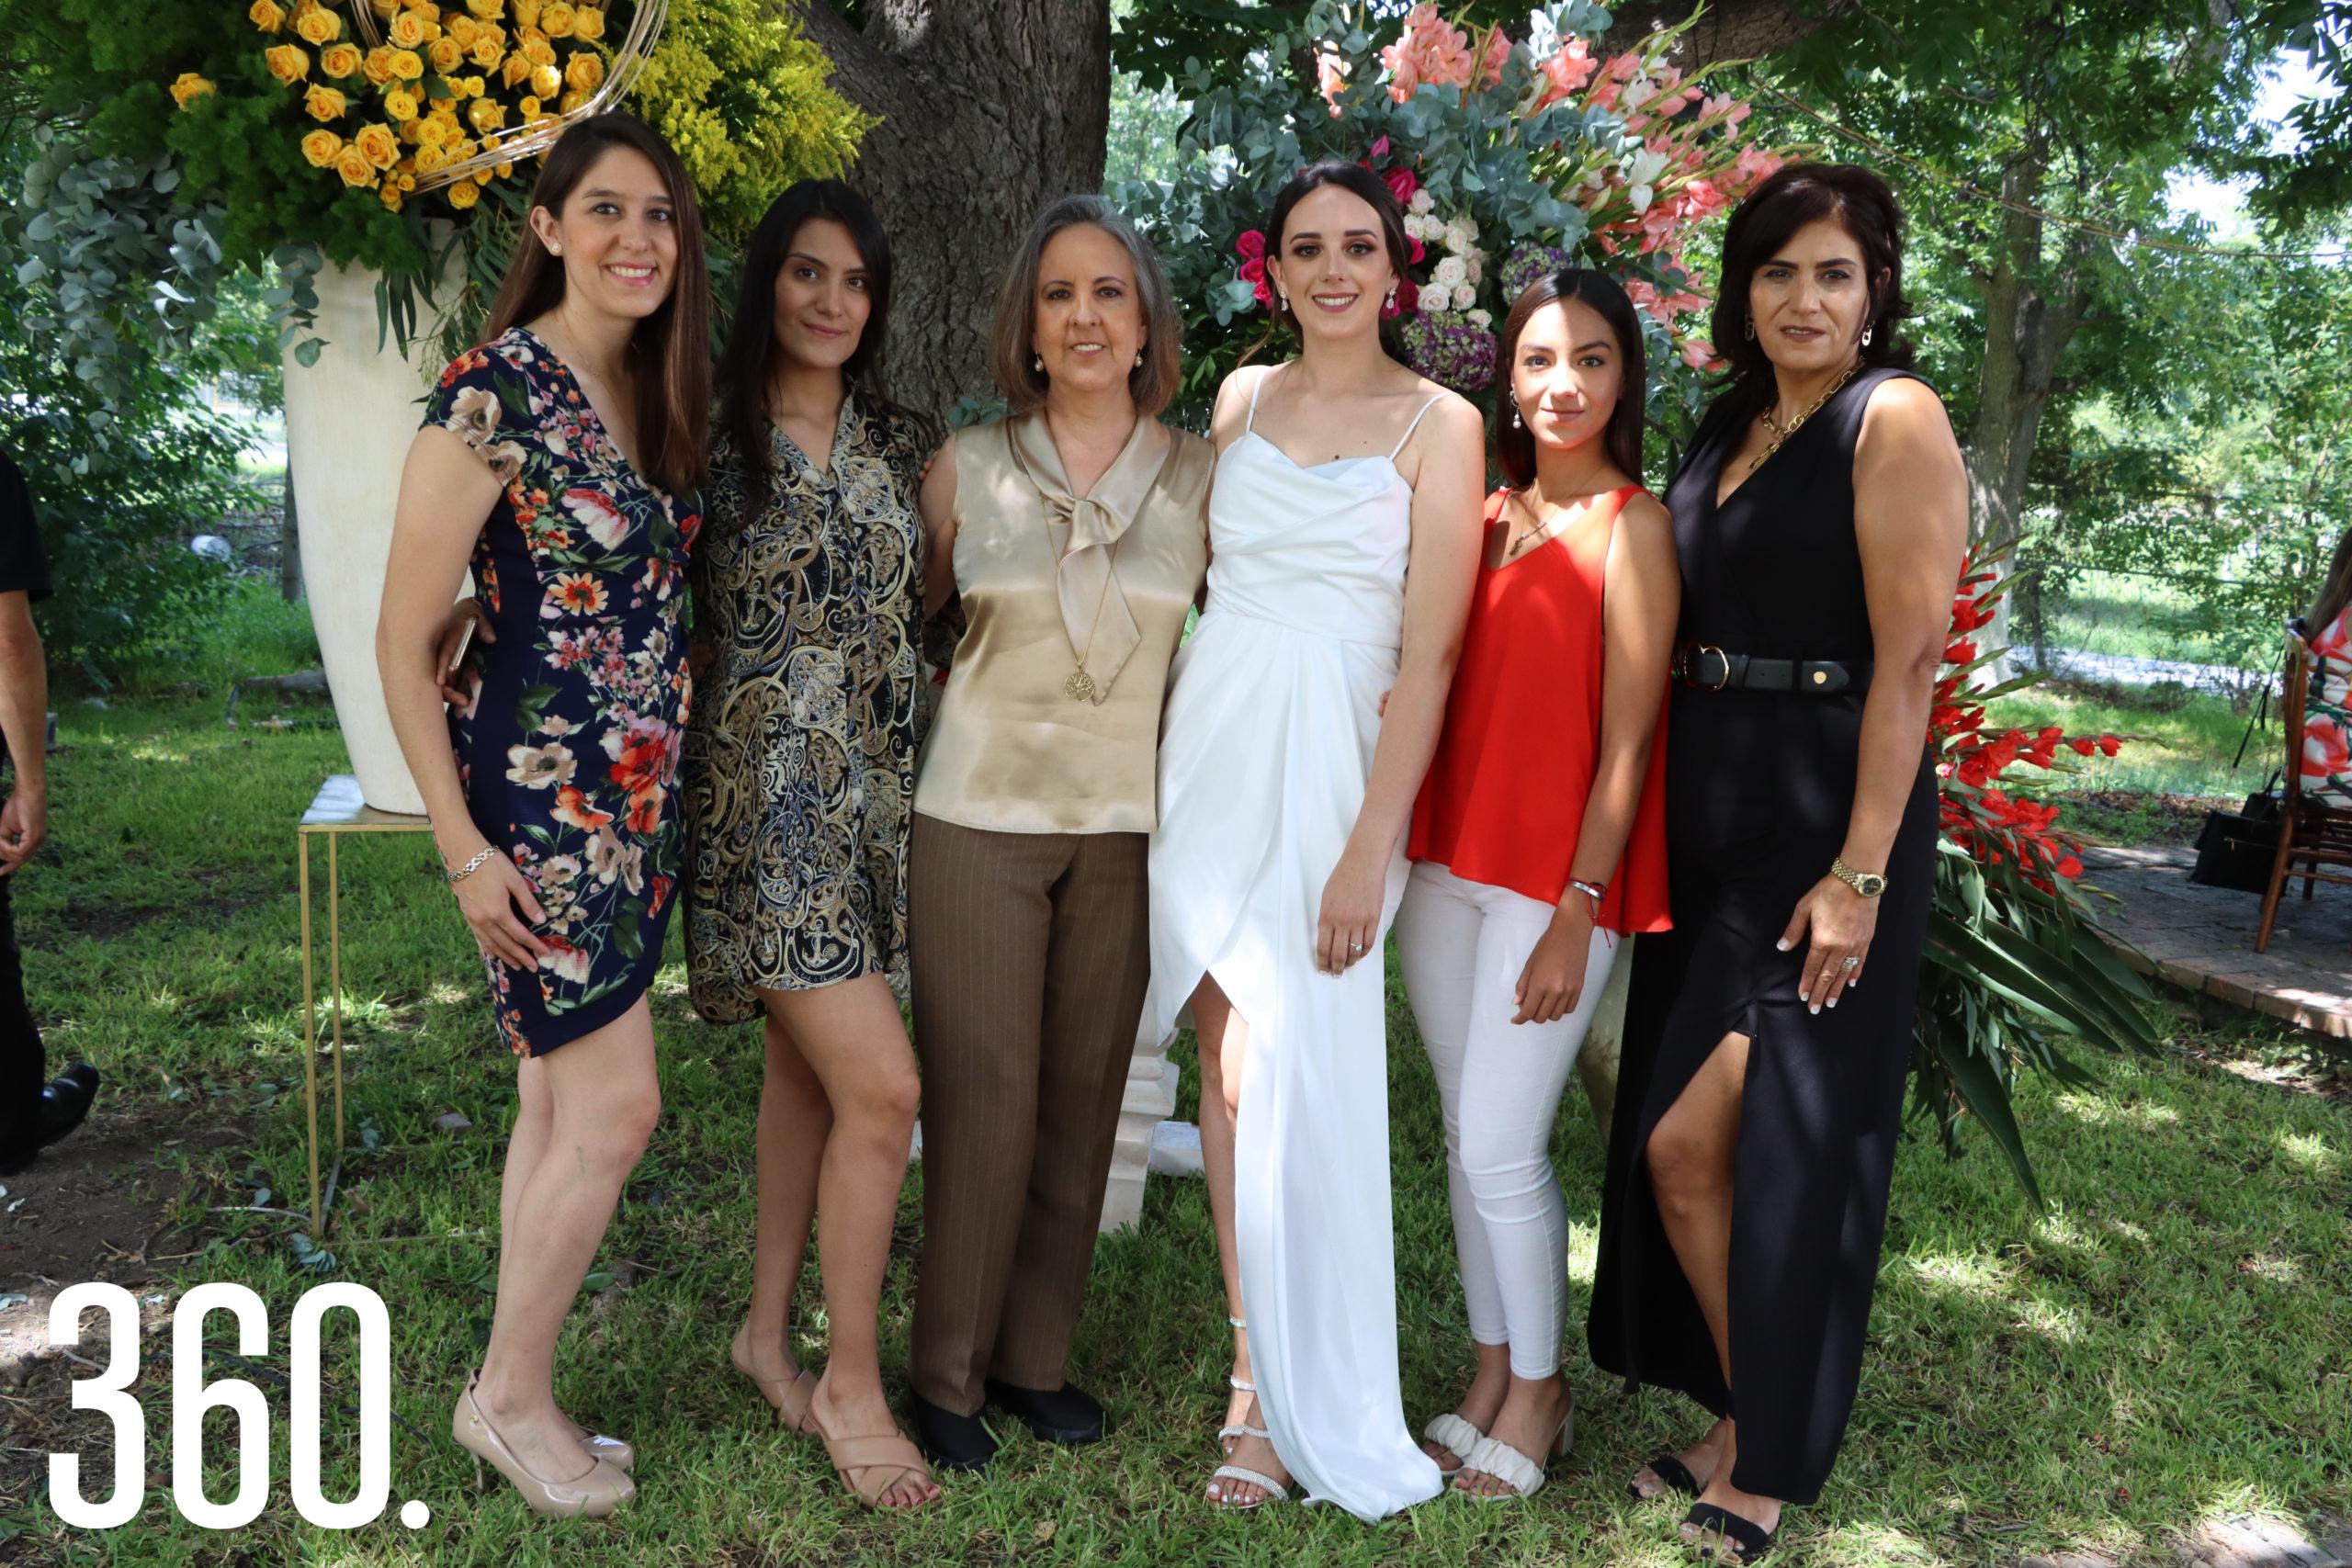 Ana Isabel, Fernanda, Ana María, Paola y Michelle Pepi acompañadas por Fernanda Rodríguez y Martha Zapata.